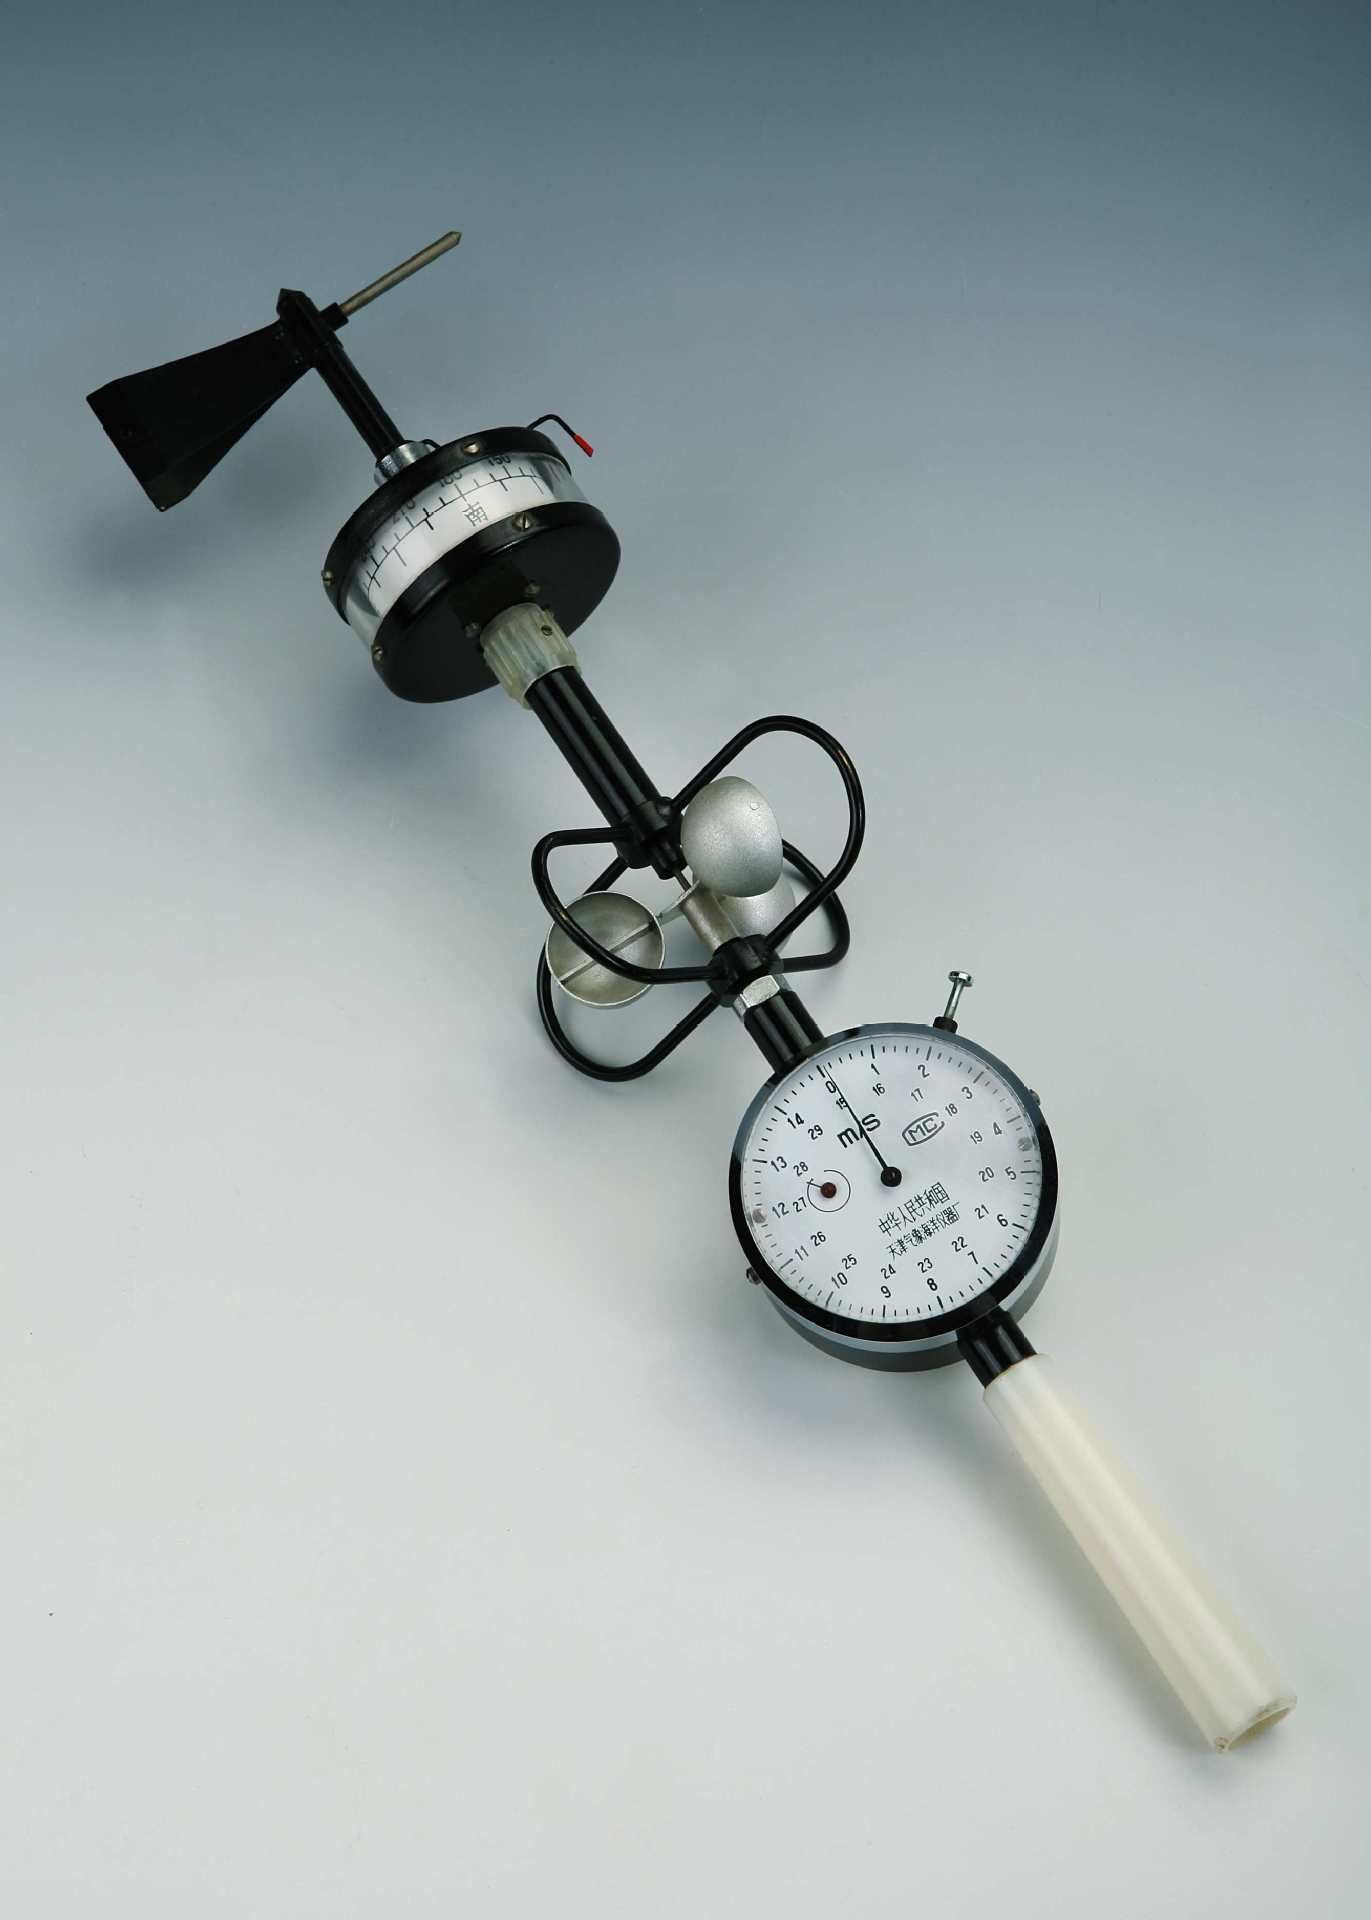 DEM6, легкий анемометр с тремя чашками направления ветра, морской Анемометр